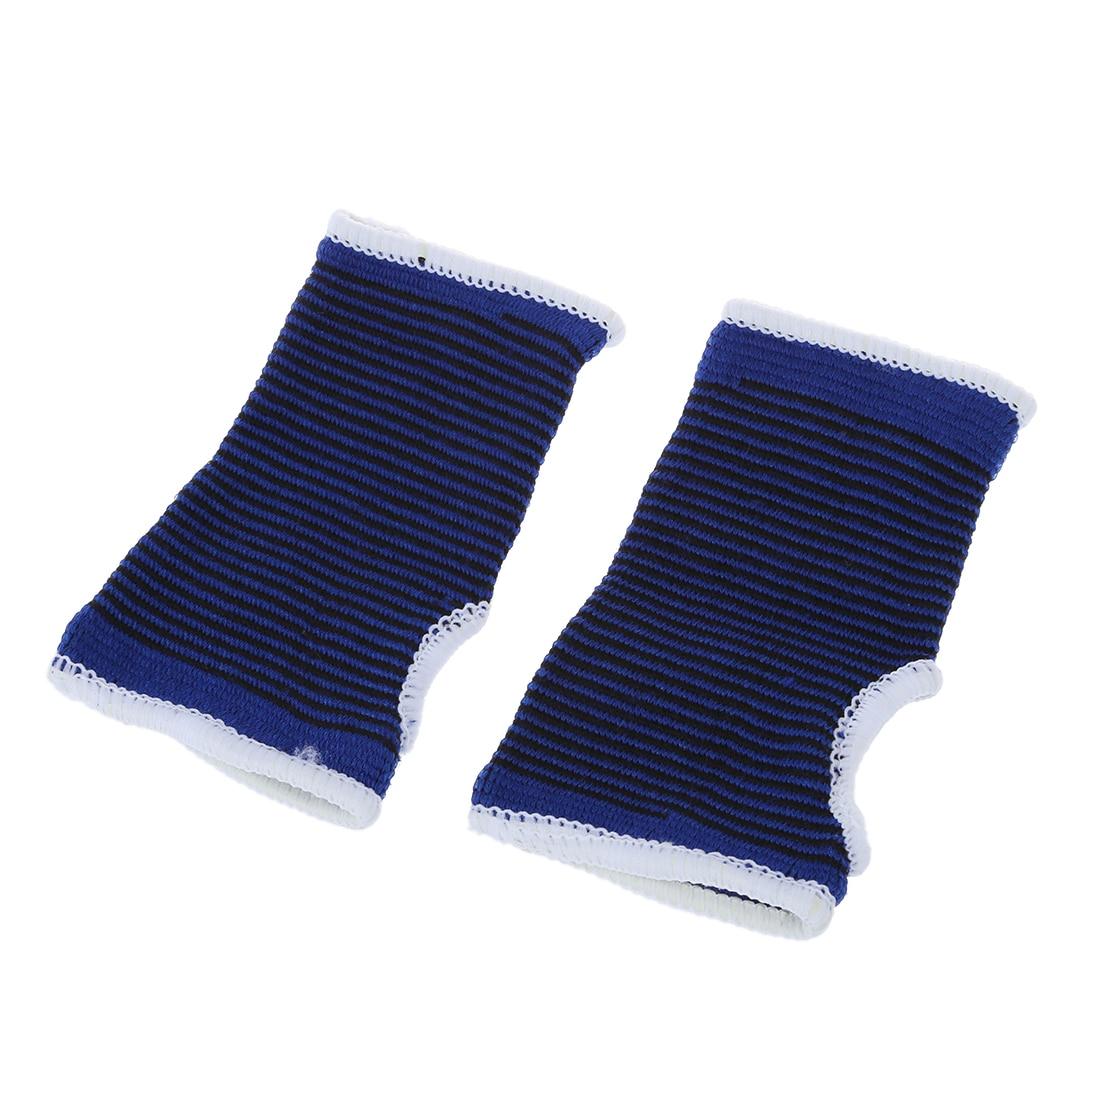 Wholesale! Pairs Blue Black Elastic Wrist Palm Support Protecting Brace